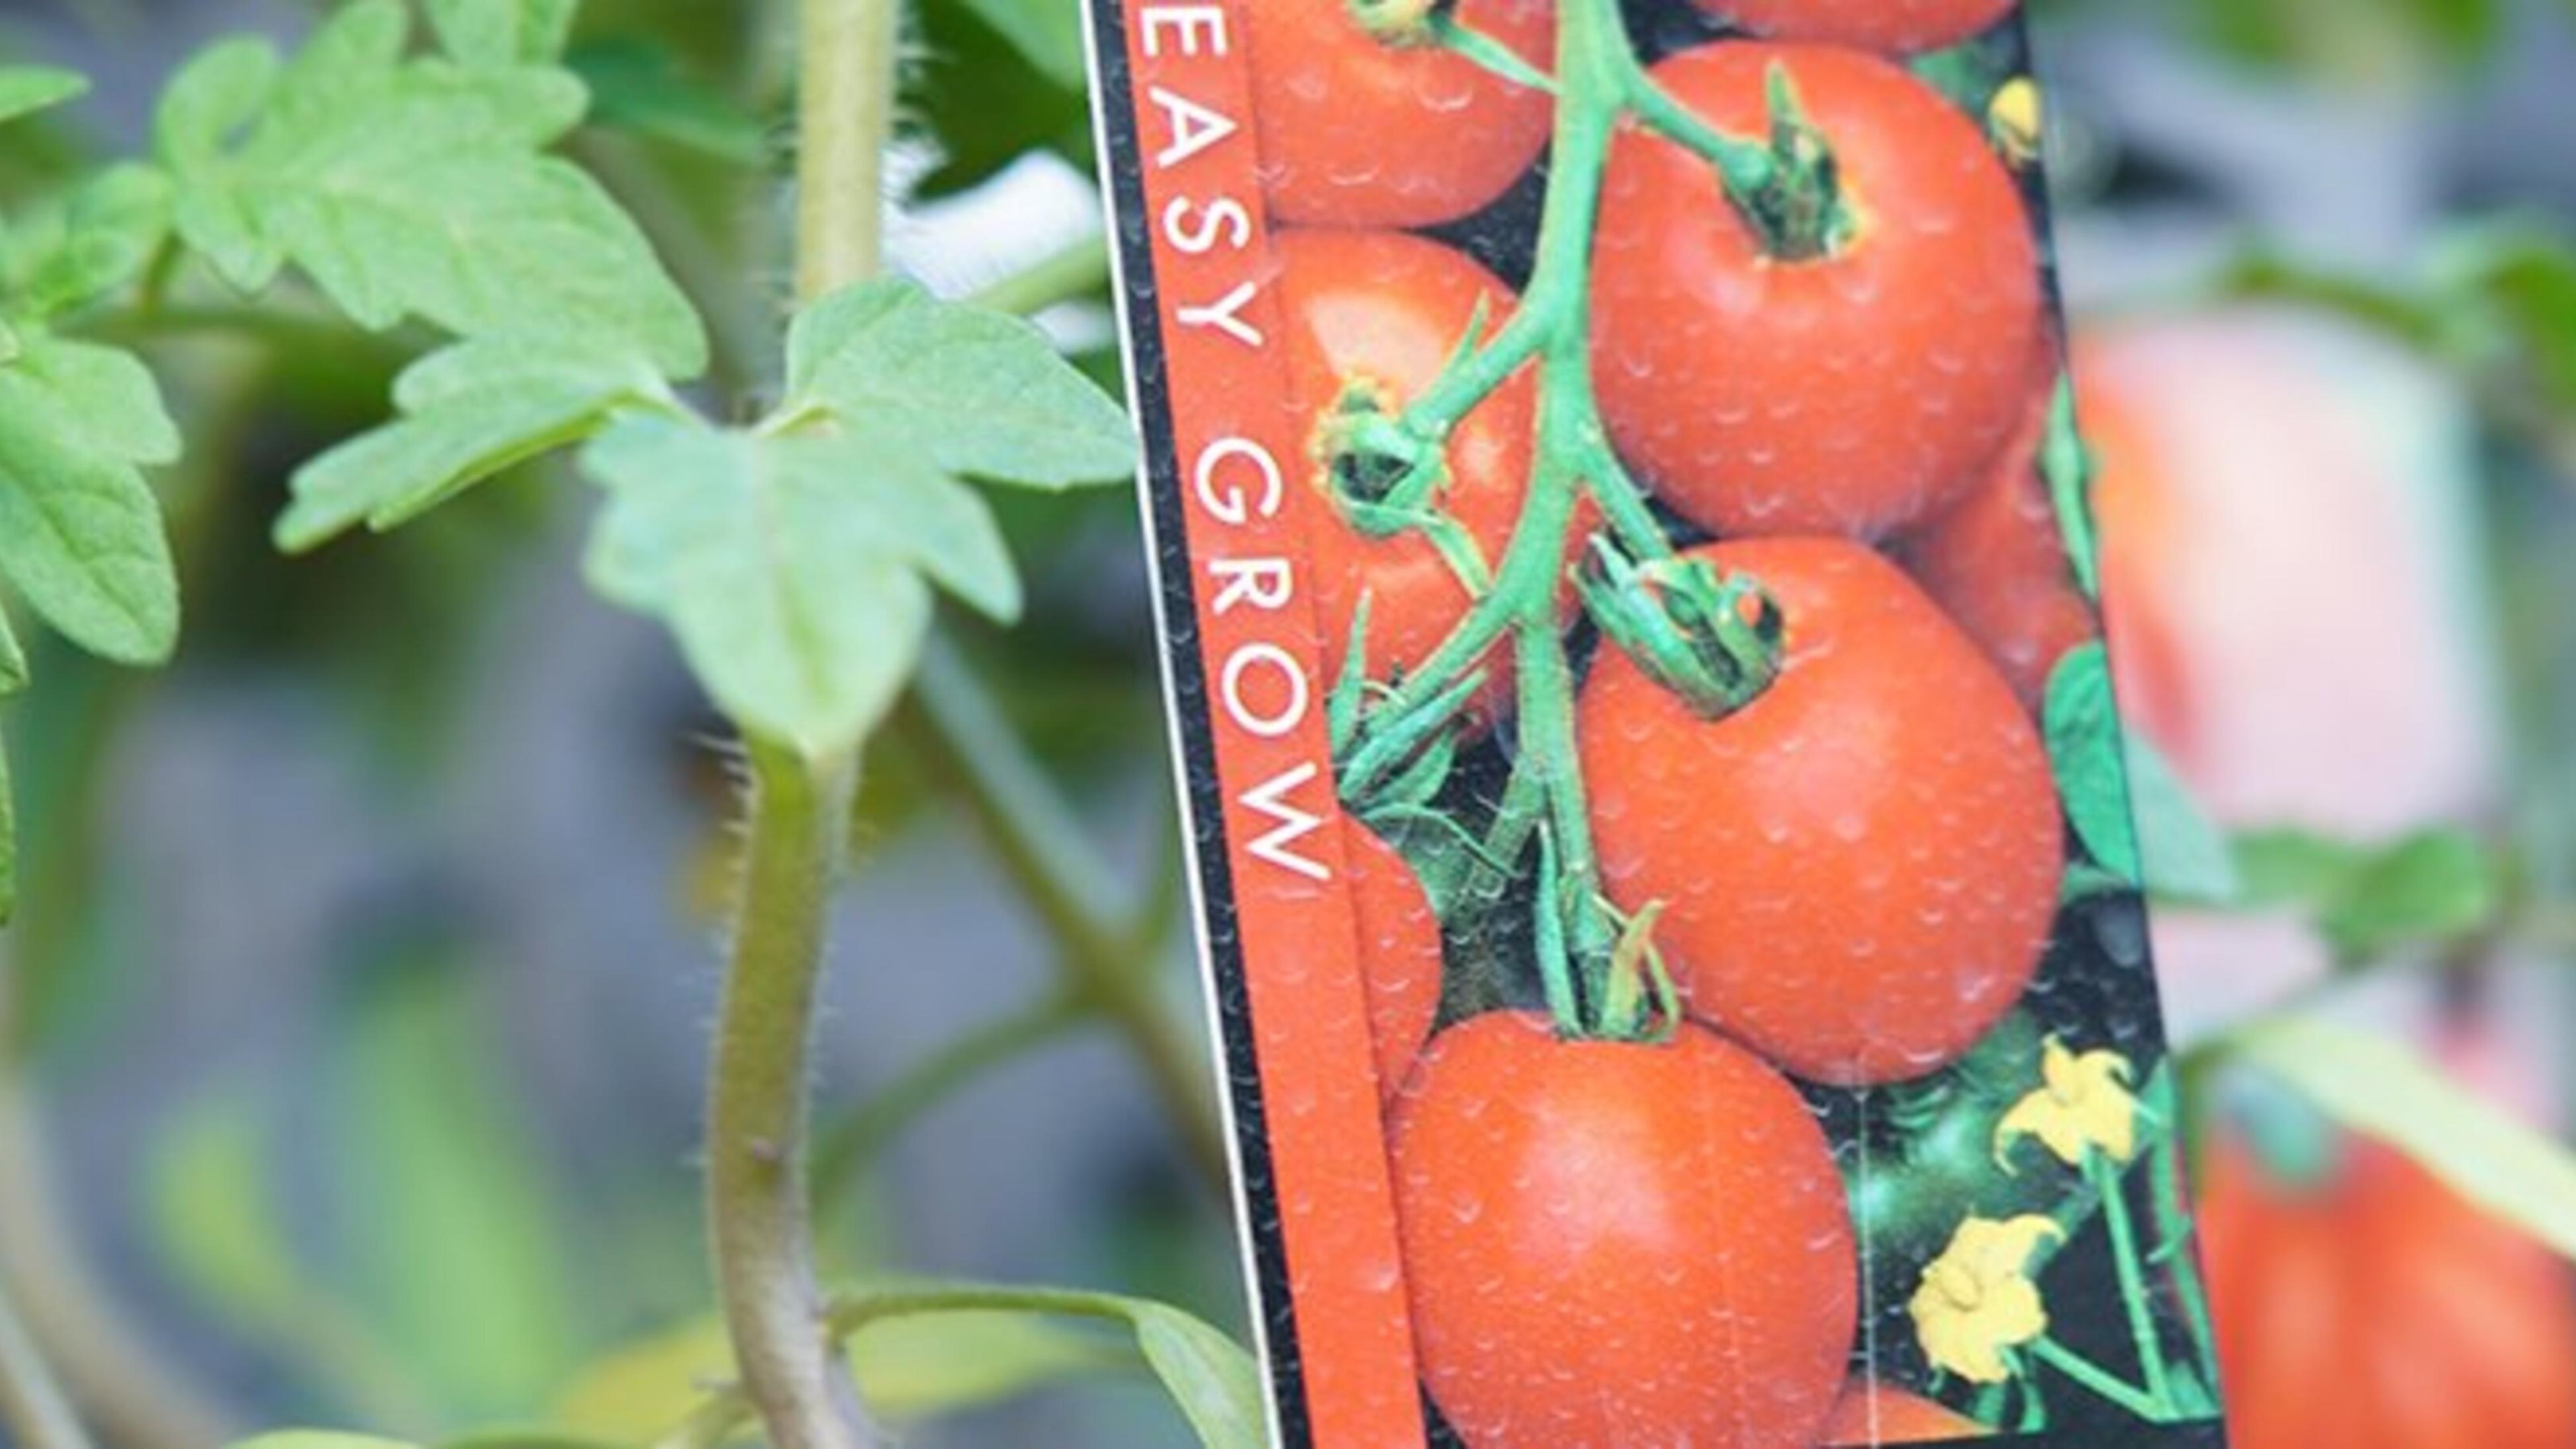 A close up of a tomato plant